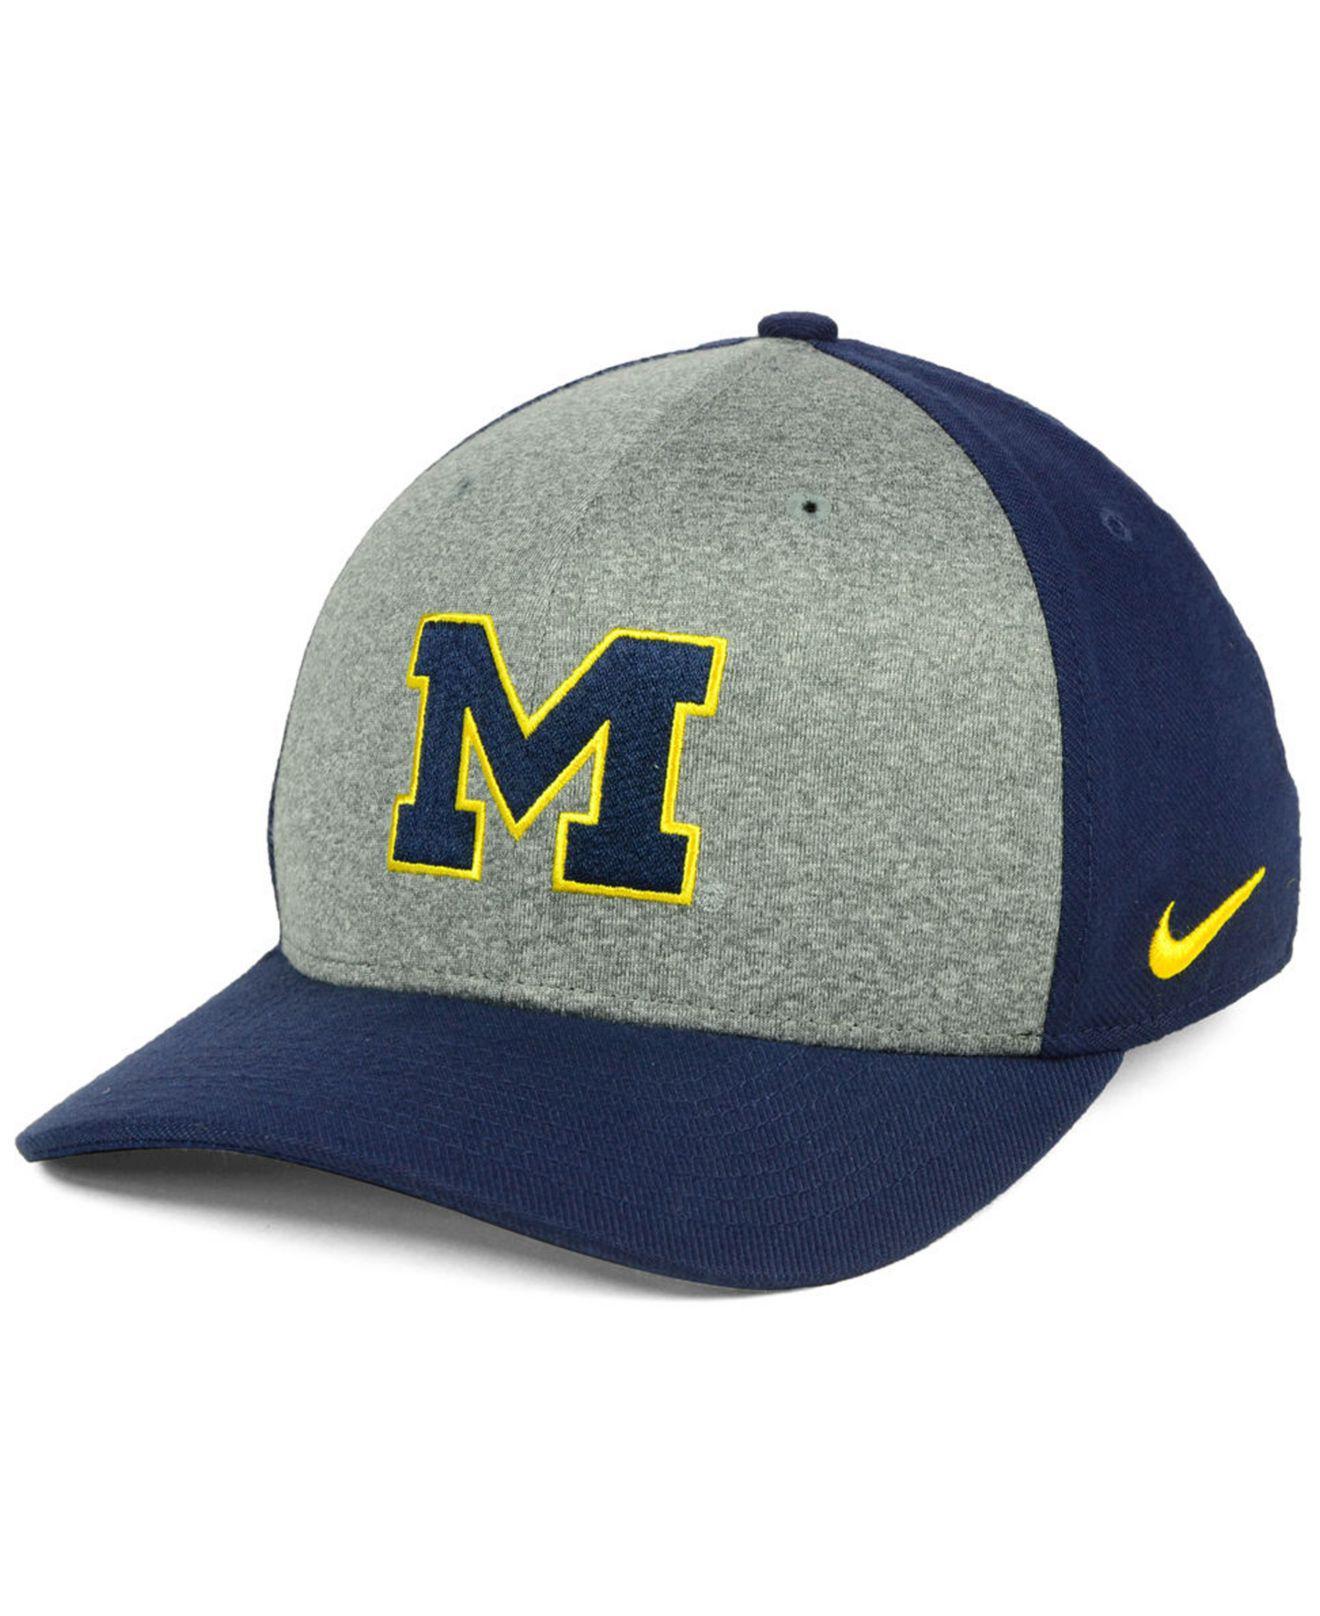 Lyst - Nike Michigan Wolverines Legend Swooshflex Cap in Blue for Men 4c2b180ca6f9